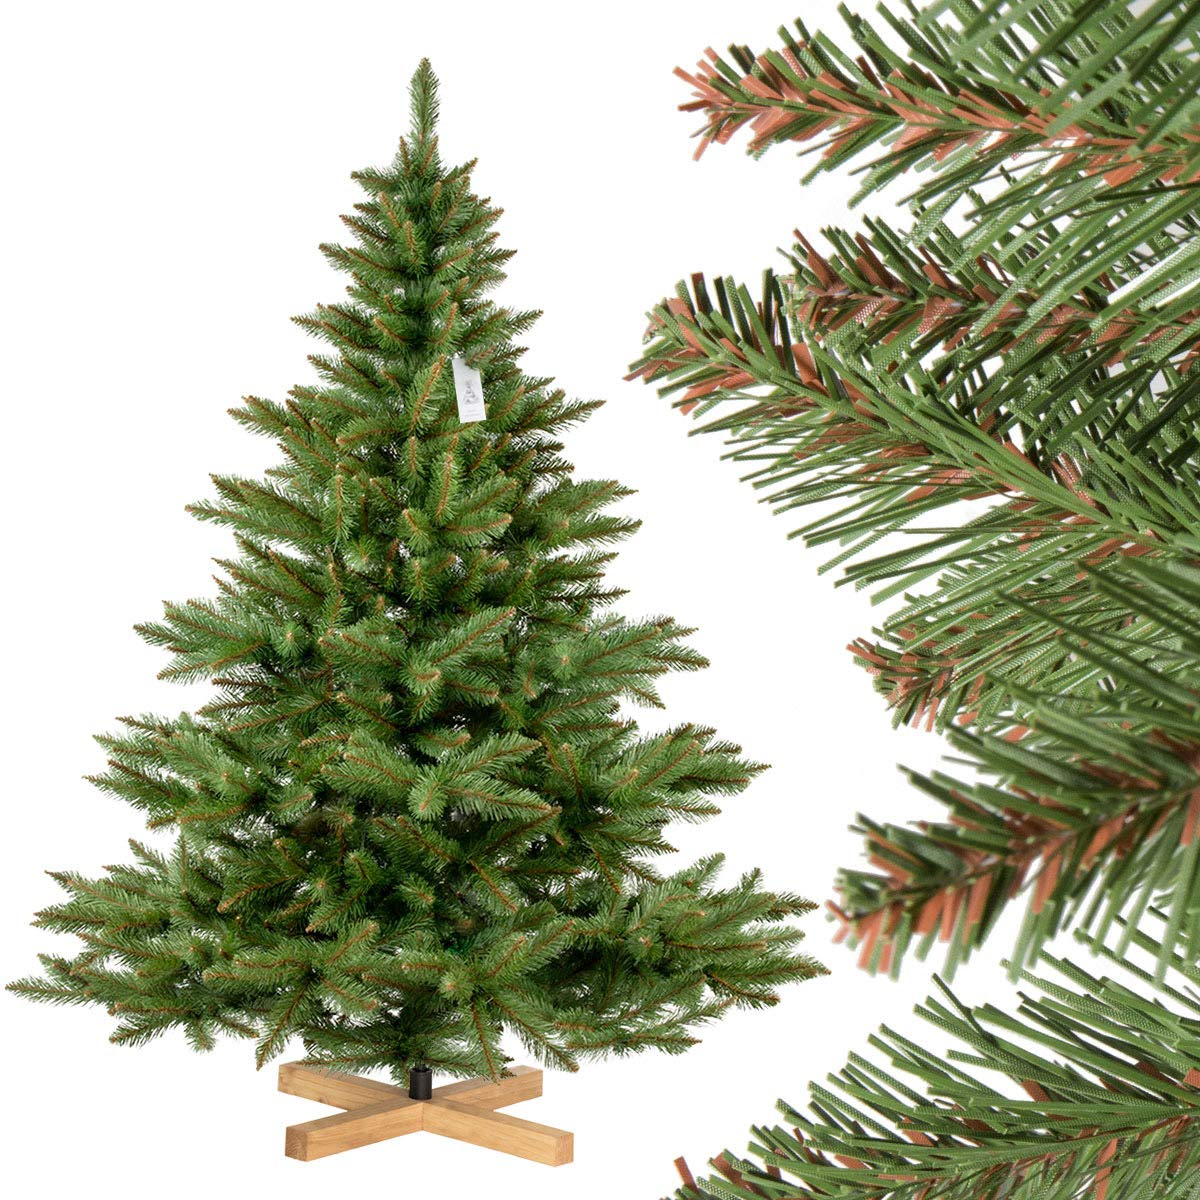 FairyTrees artificial Christmas tree NORDMANN'S FIR, green trunk, PVC material, wooden stand, 6ft / 180cm, FT14-180